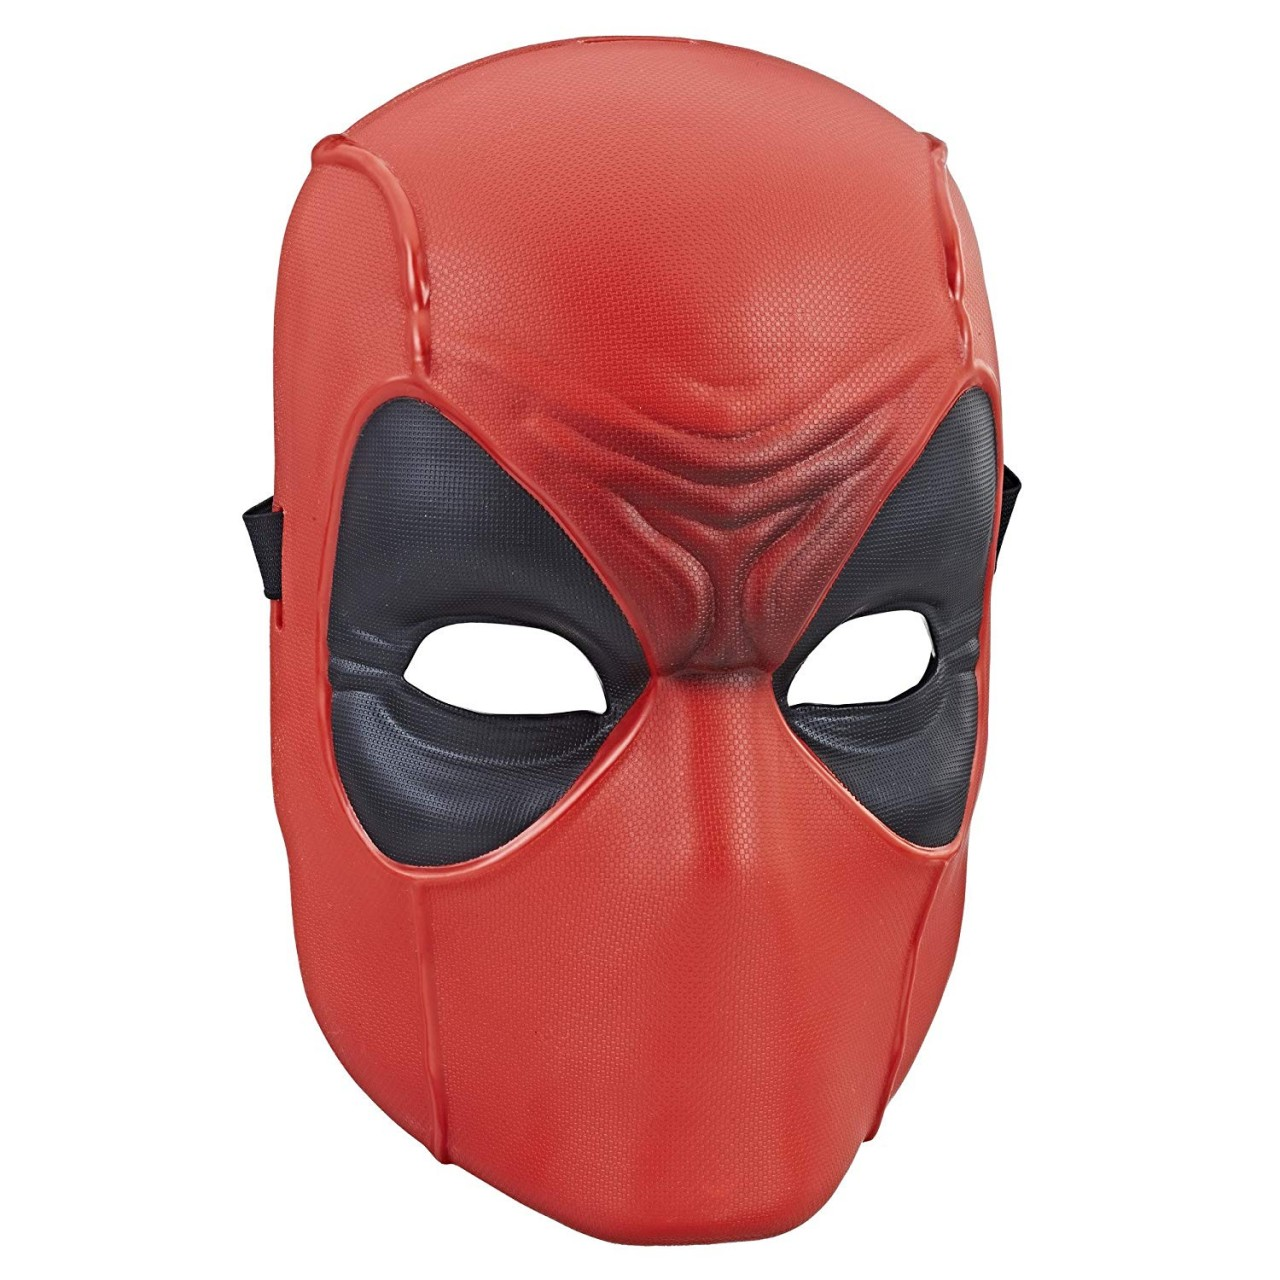 Маска Мстителей Дэдпул (Deadpool) Marvel от Hasbro E2934